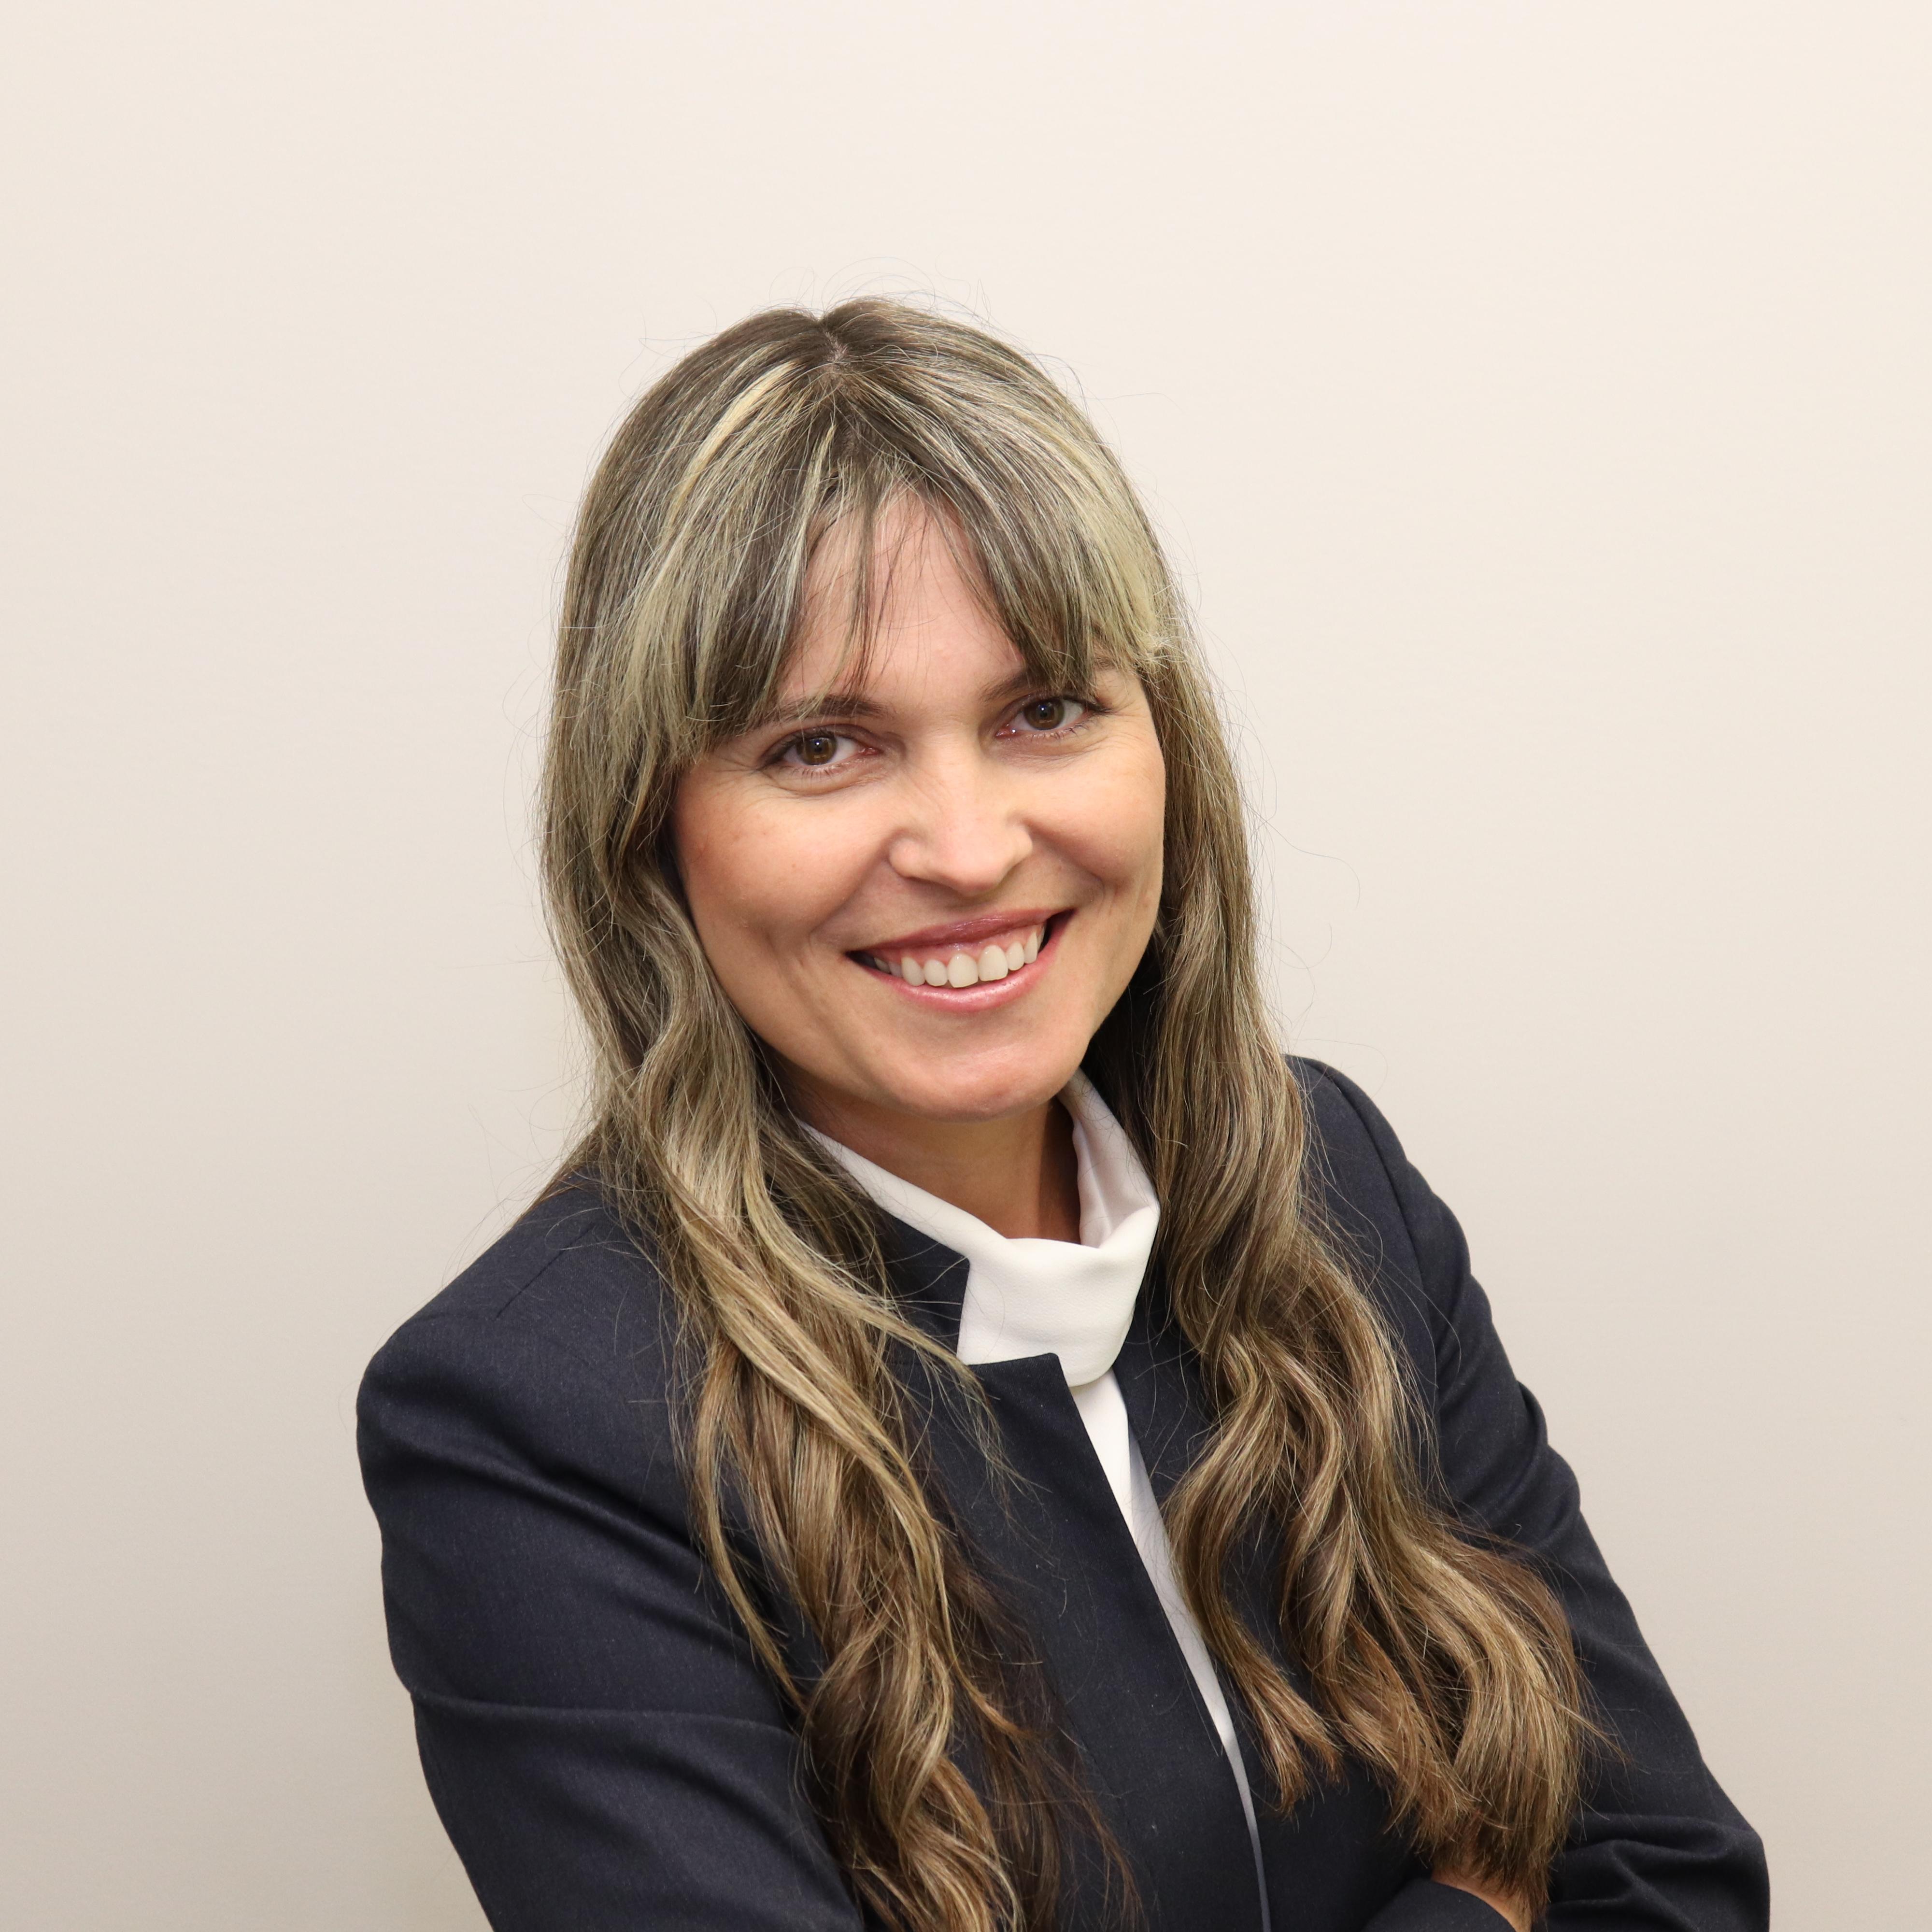 ELENA LITANI - VP of Engineering, KOHO, Canada